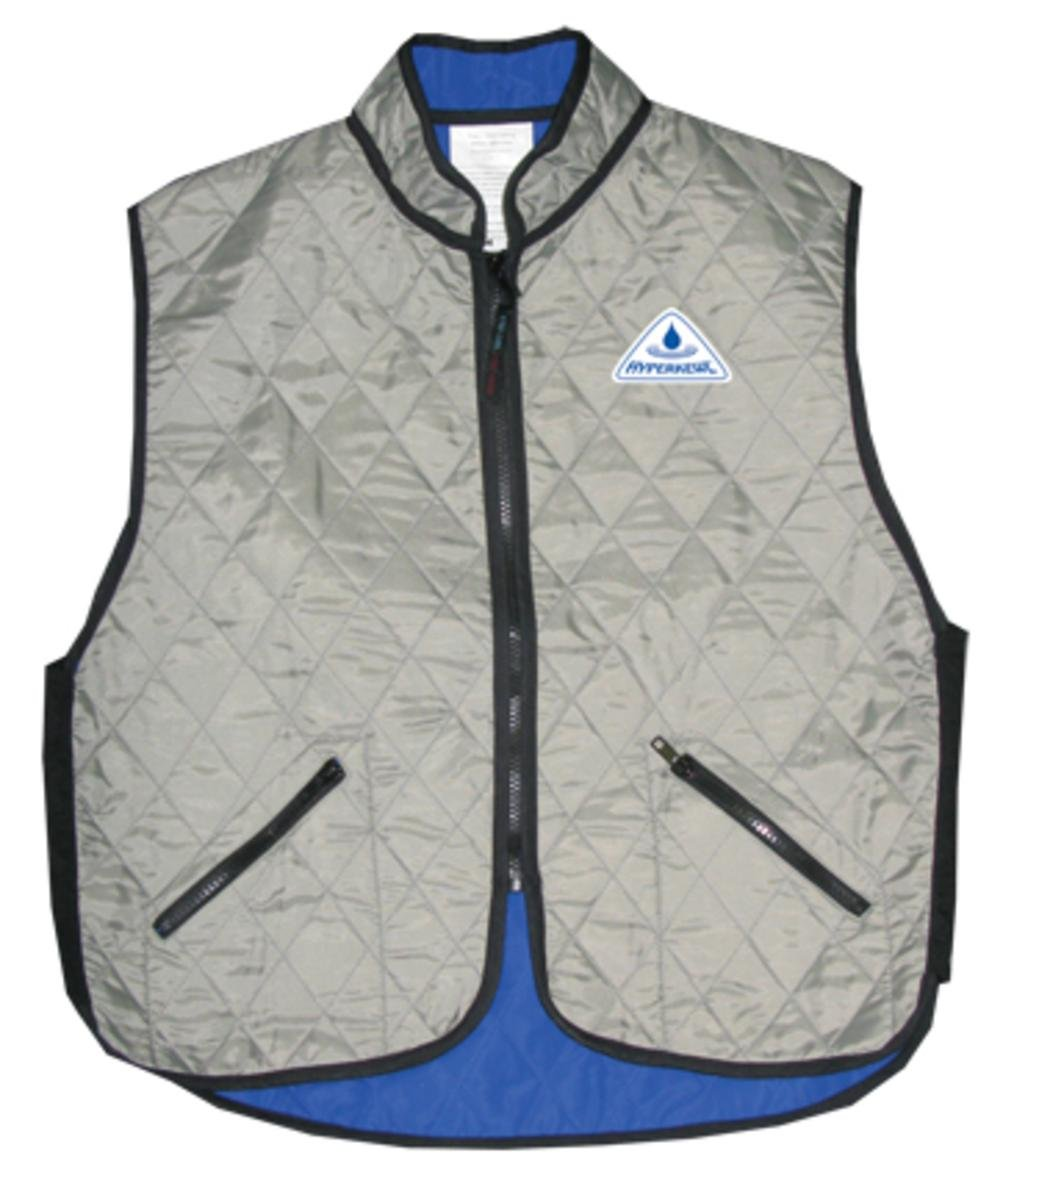 Techniche Deluxe Evaporative Cooling Vest